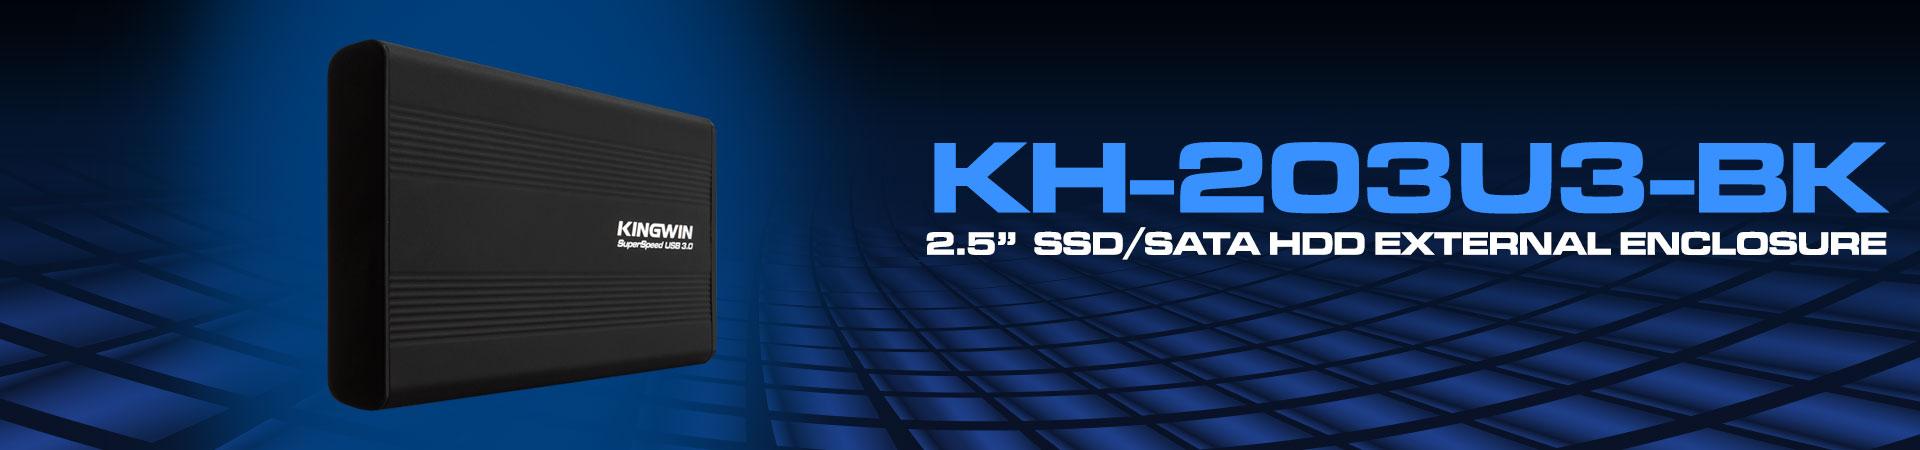 KH_203U3_BK_Banner2